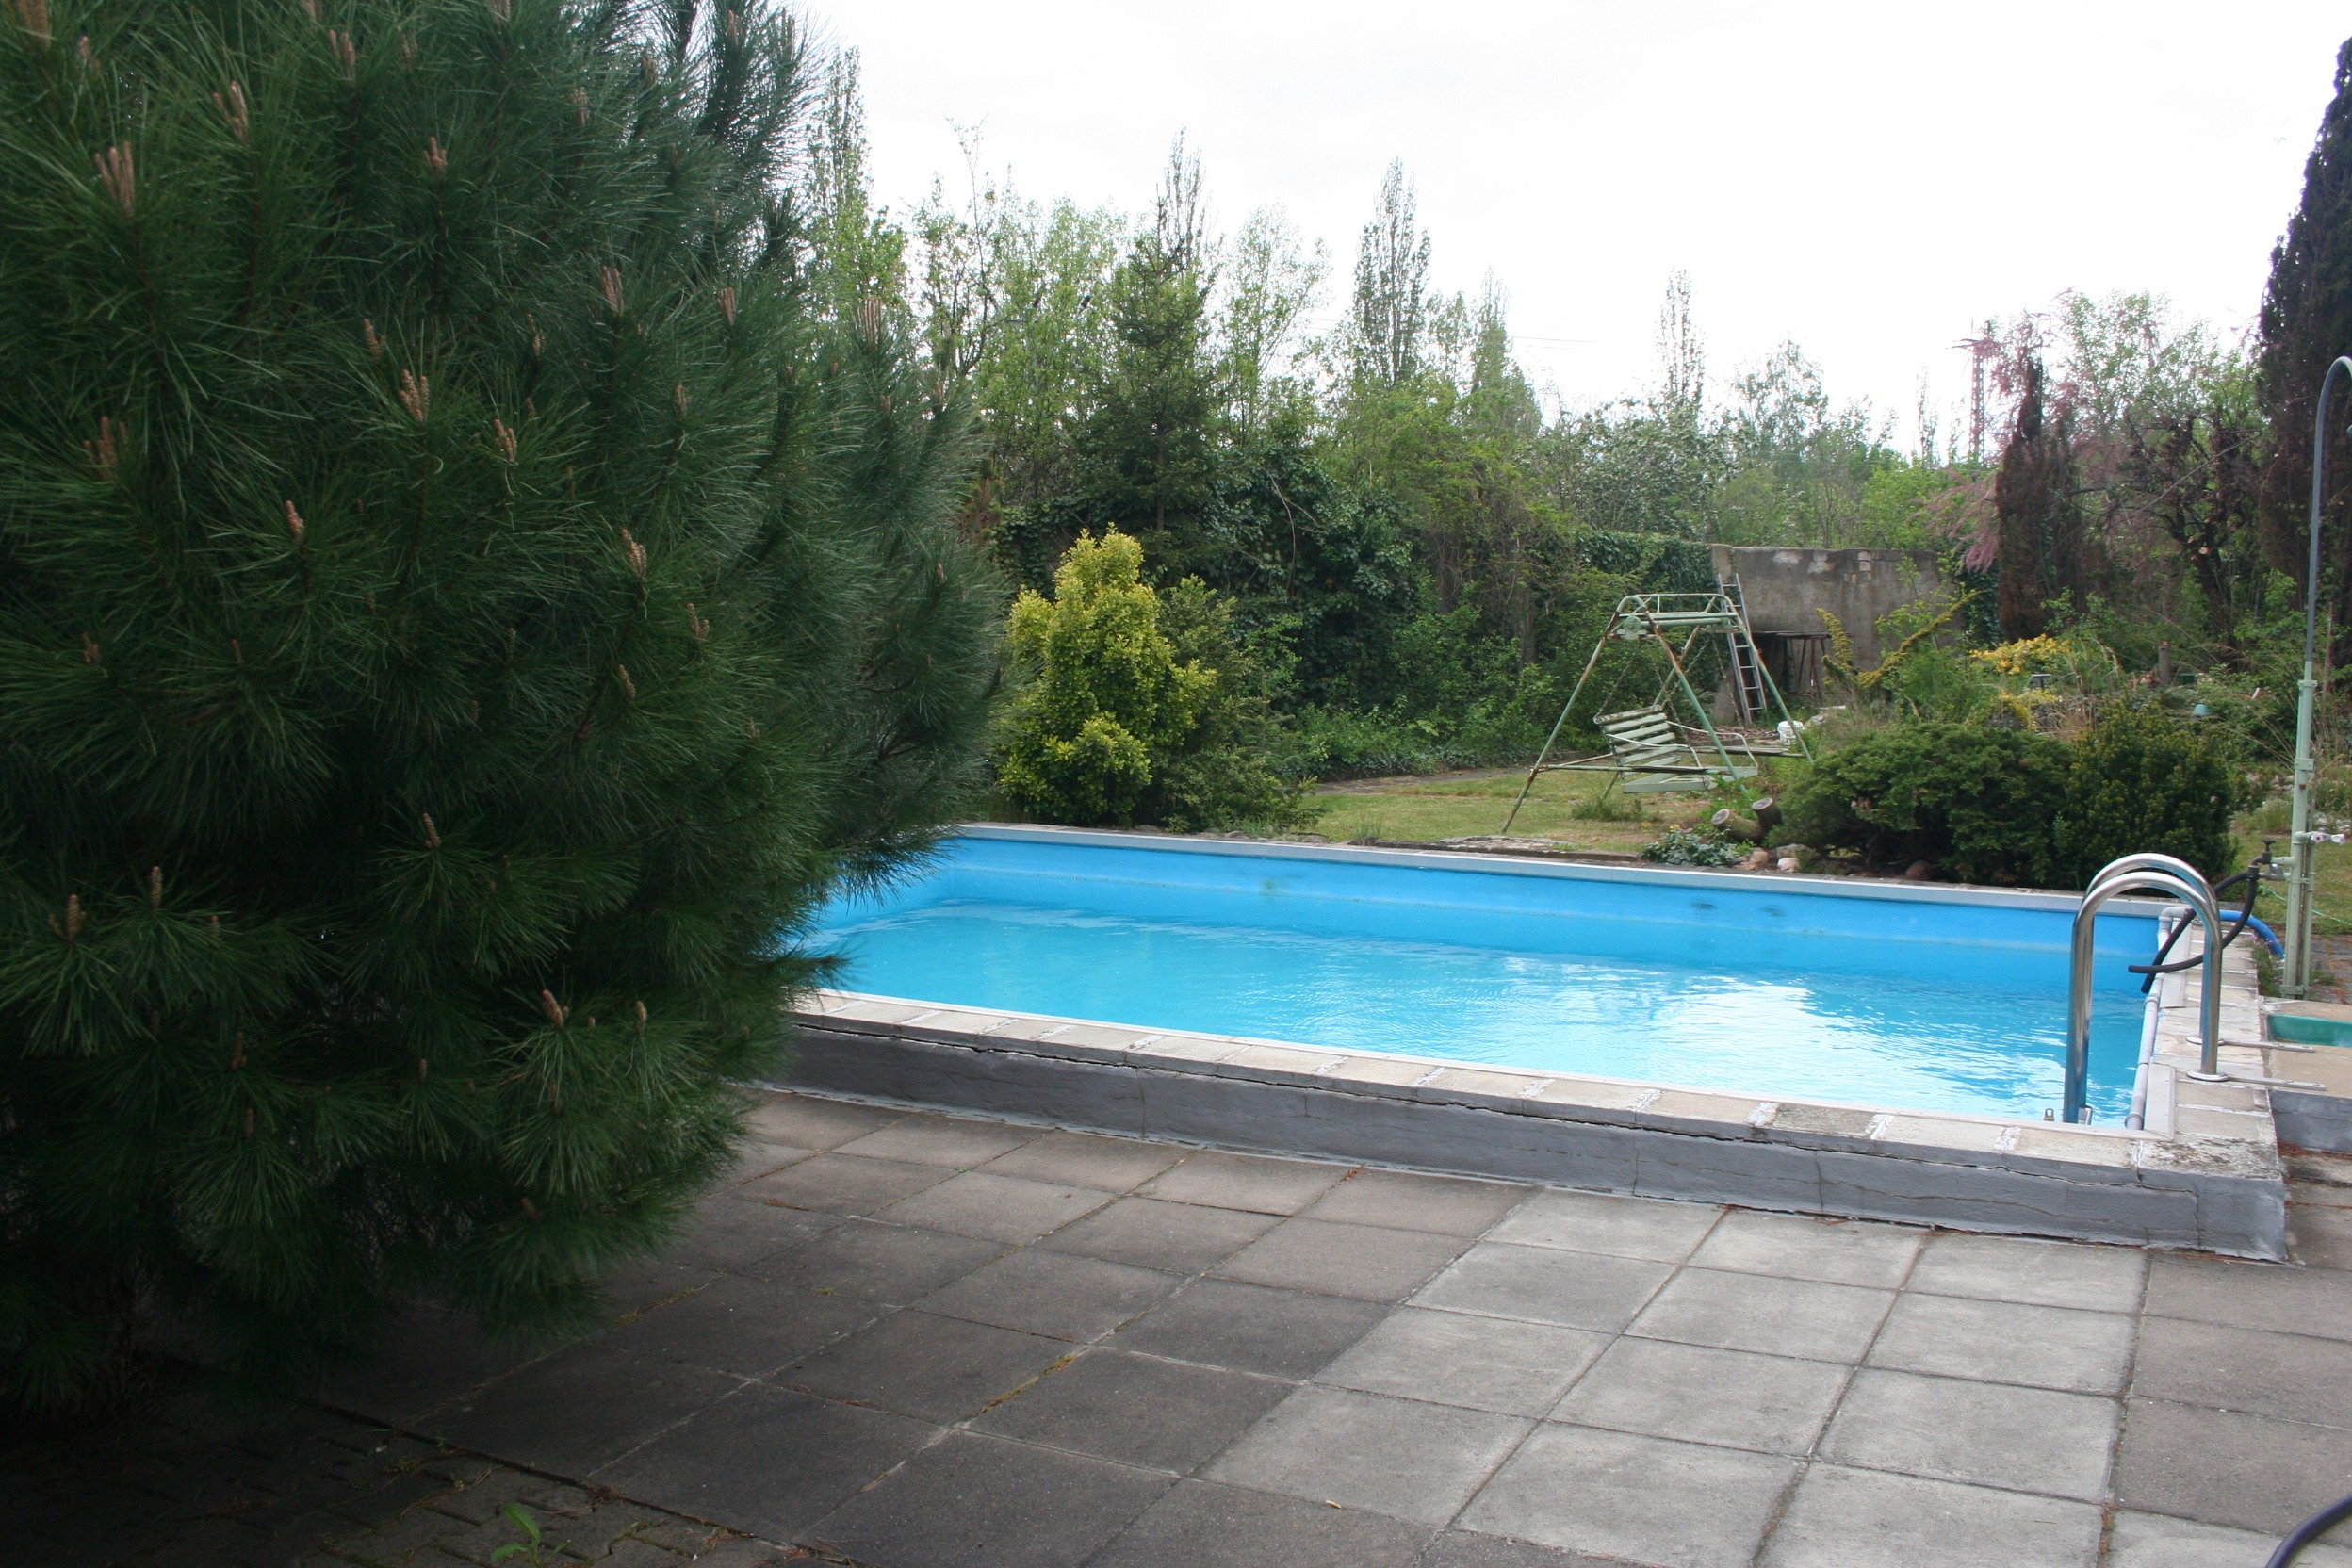 Wochenendidyll in Halle - Pool